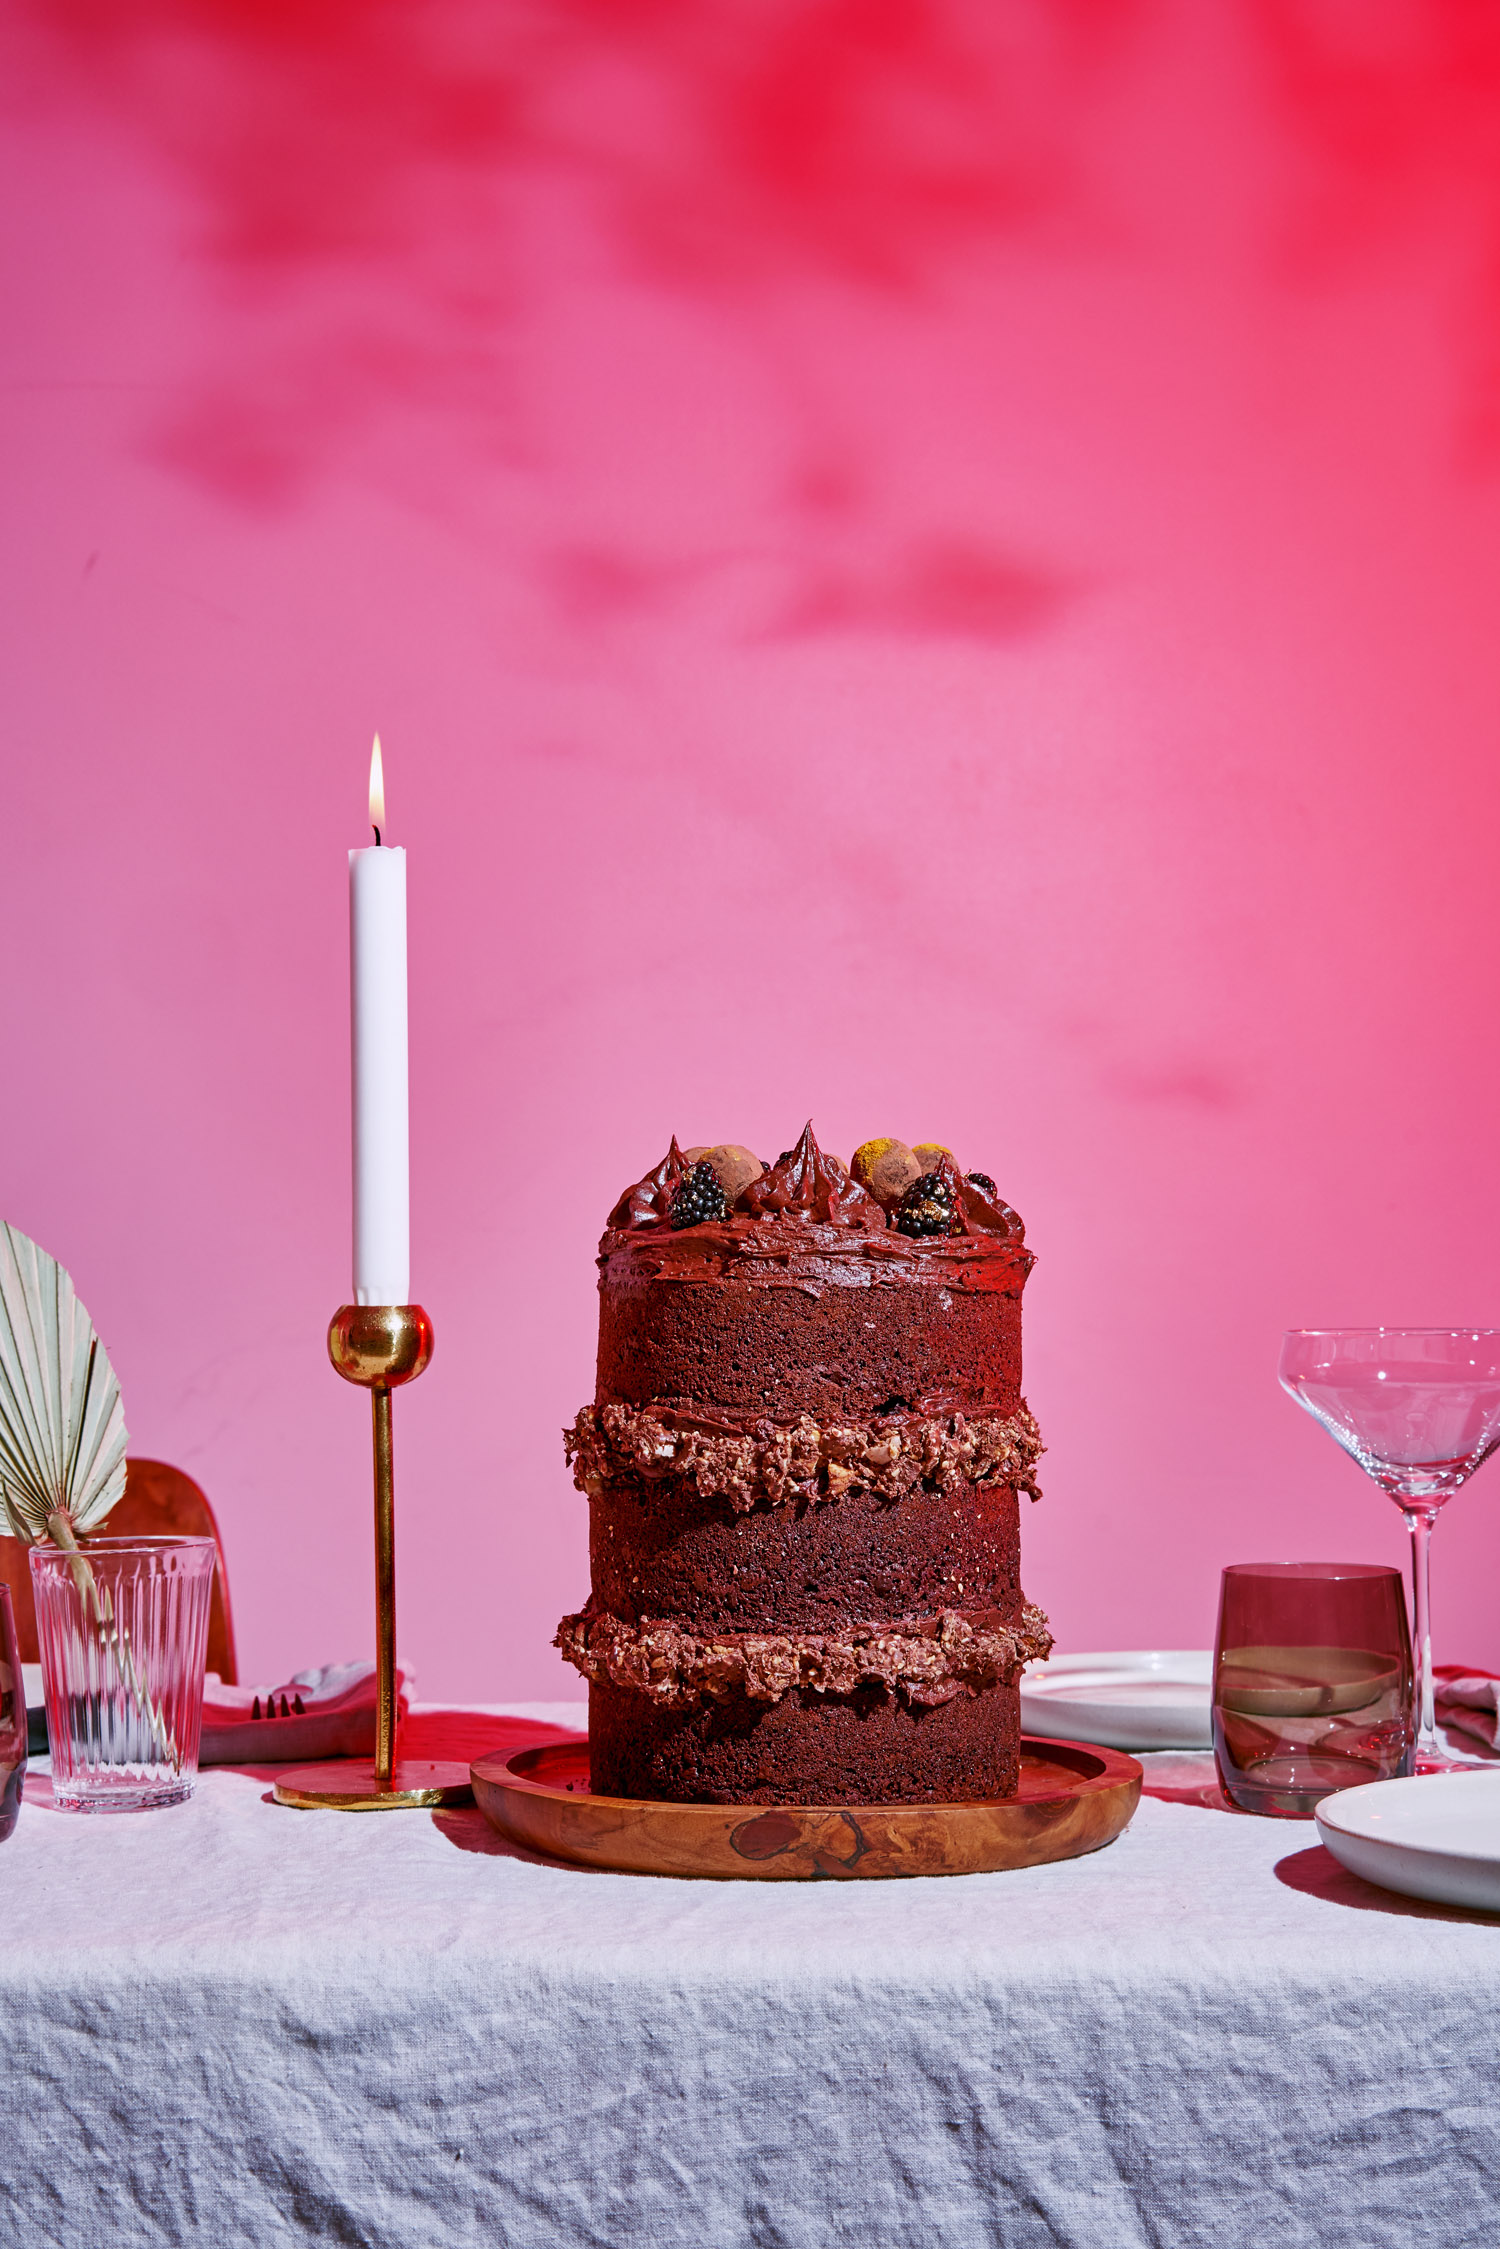 west-elm-xmas-cake-03.jpg